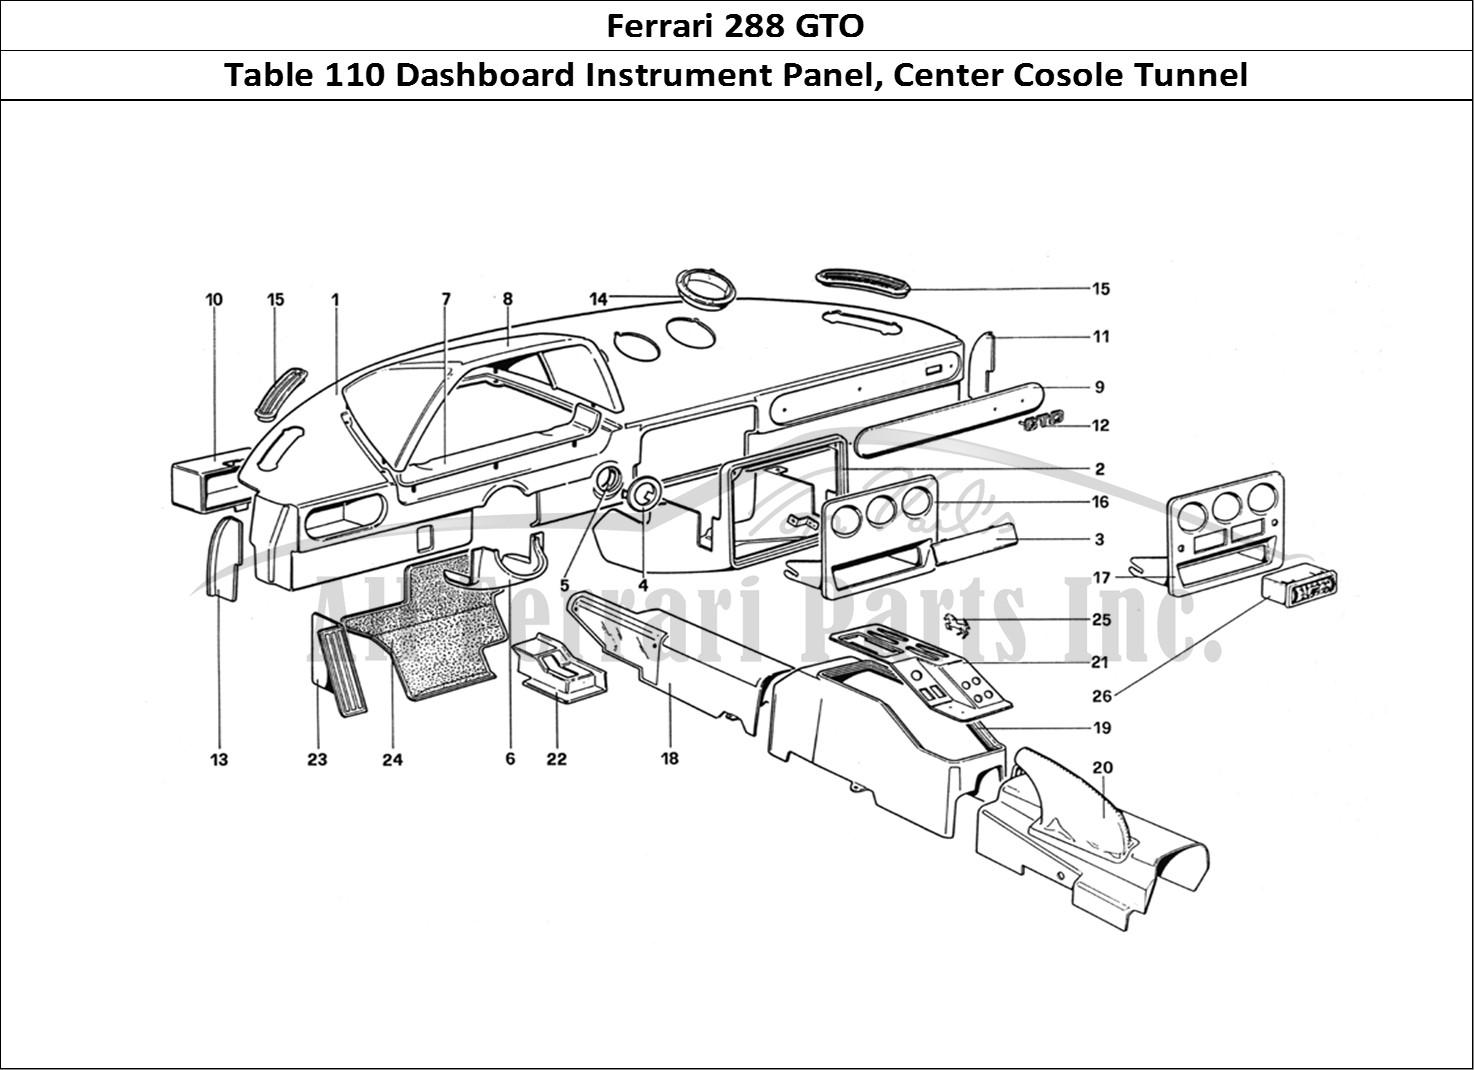 Buy Original Ferrari 288 Gto 110 Dashboard Instrument